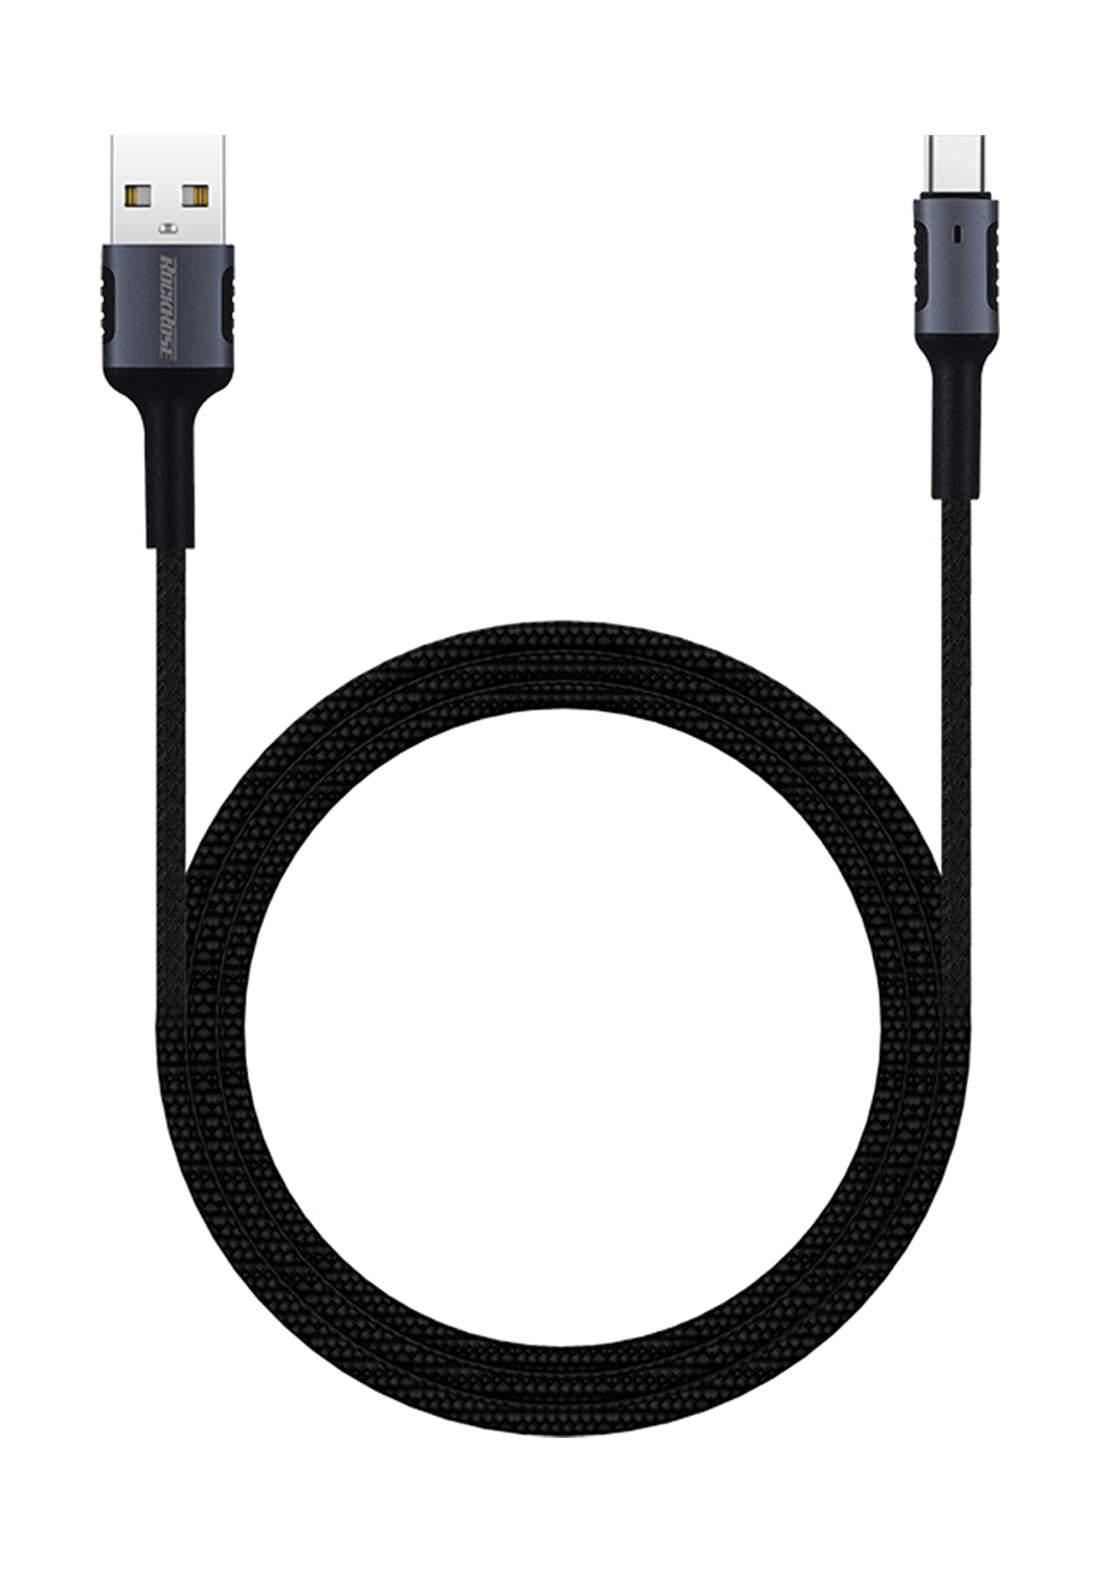 (4130)RockRose RRCS06C USB to USB Type-C Cable 1m - Black كابل